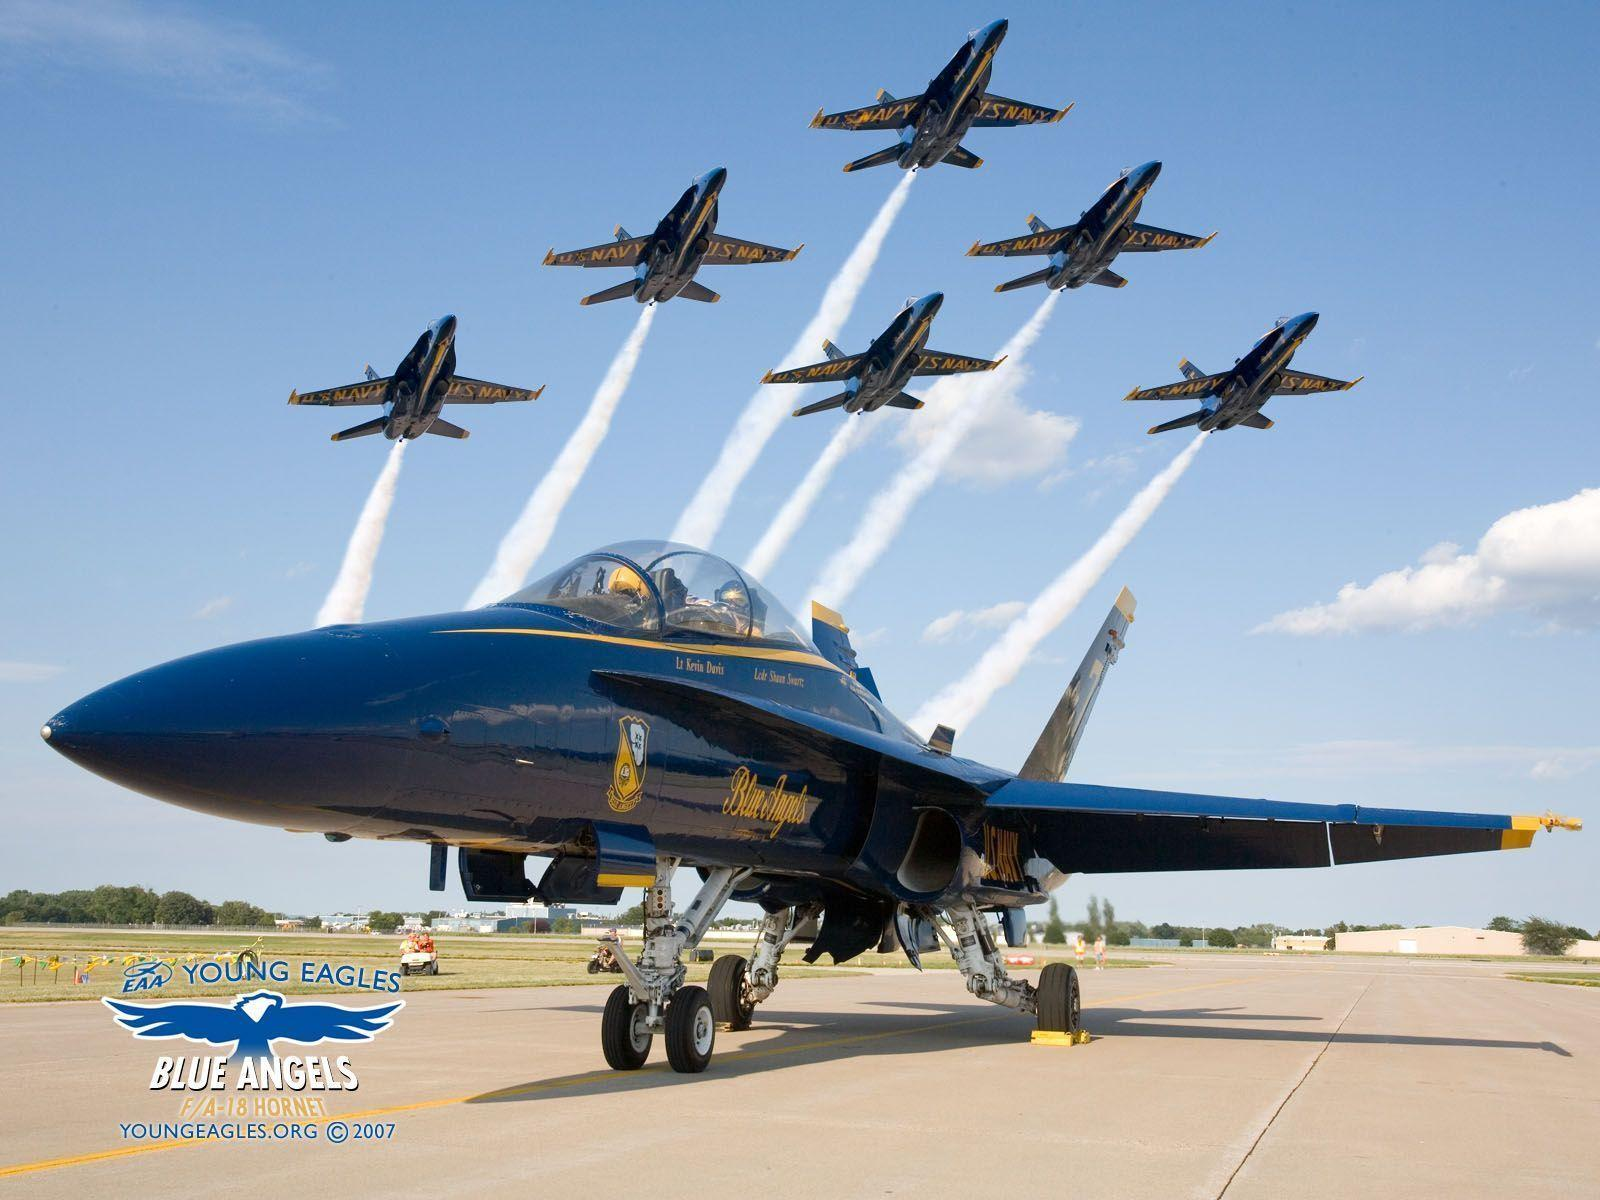 pin blue angels hd - photo #19